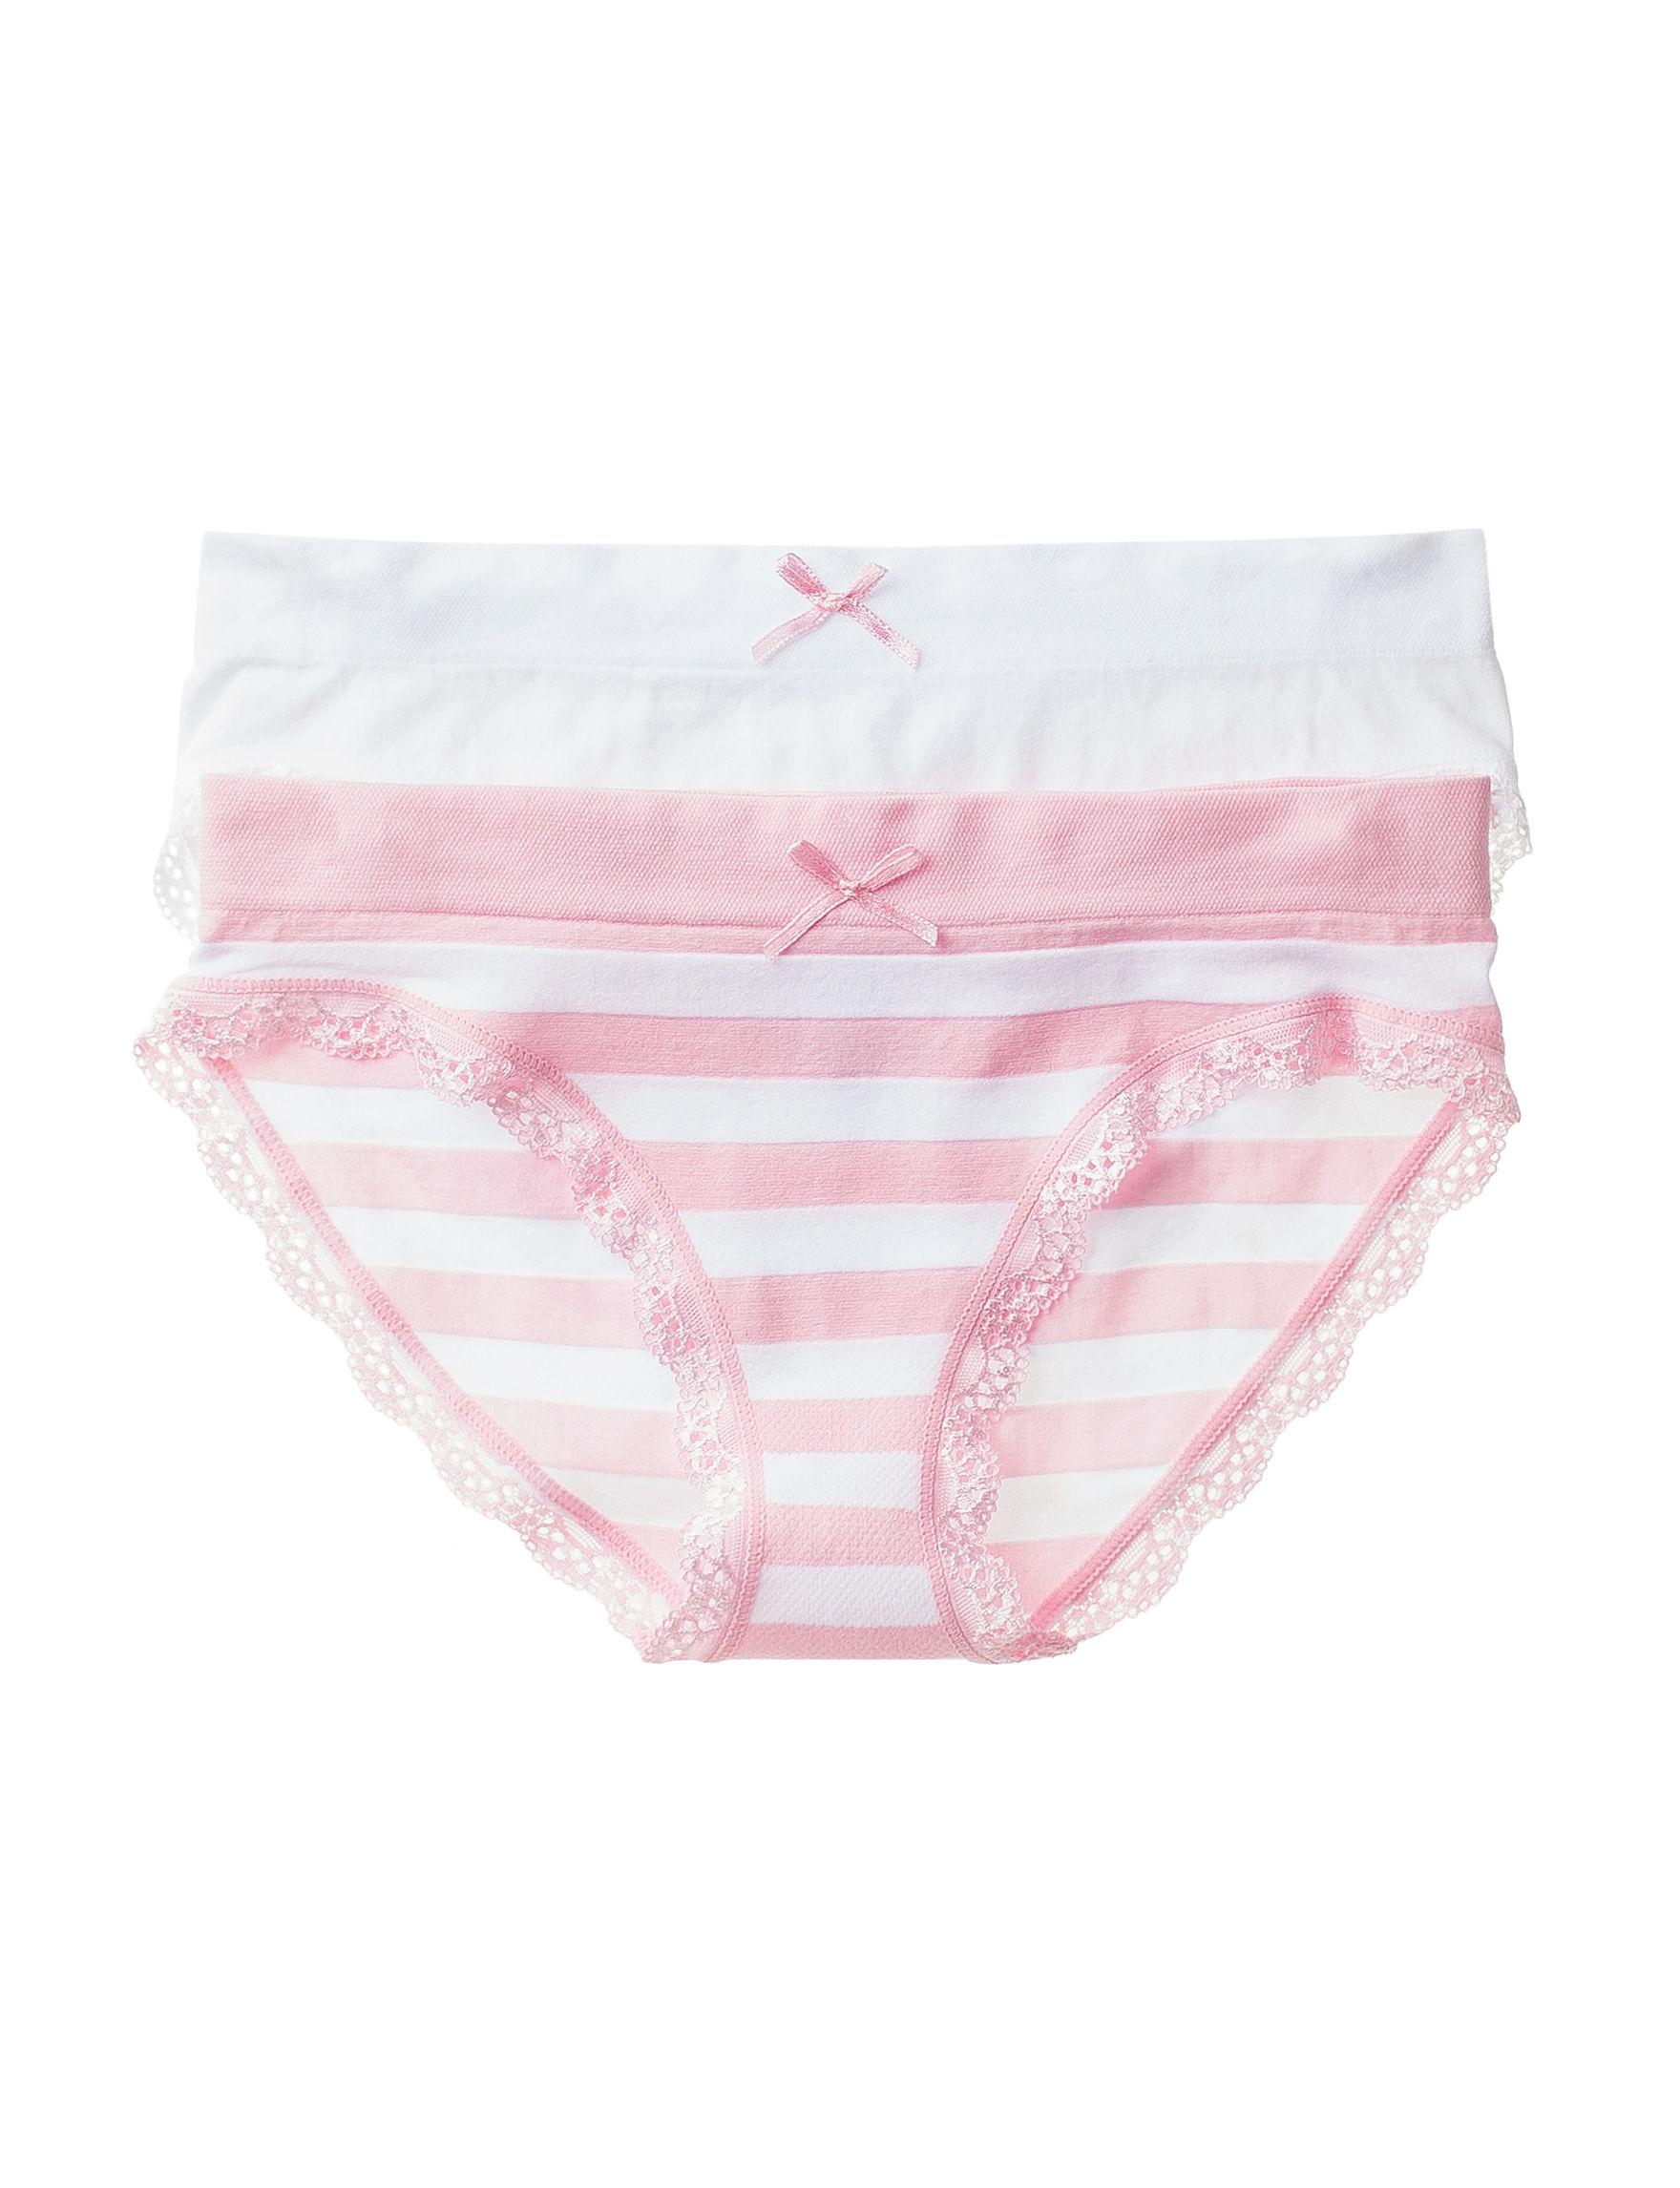 Laura Ashley Multi Panties